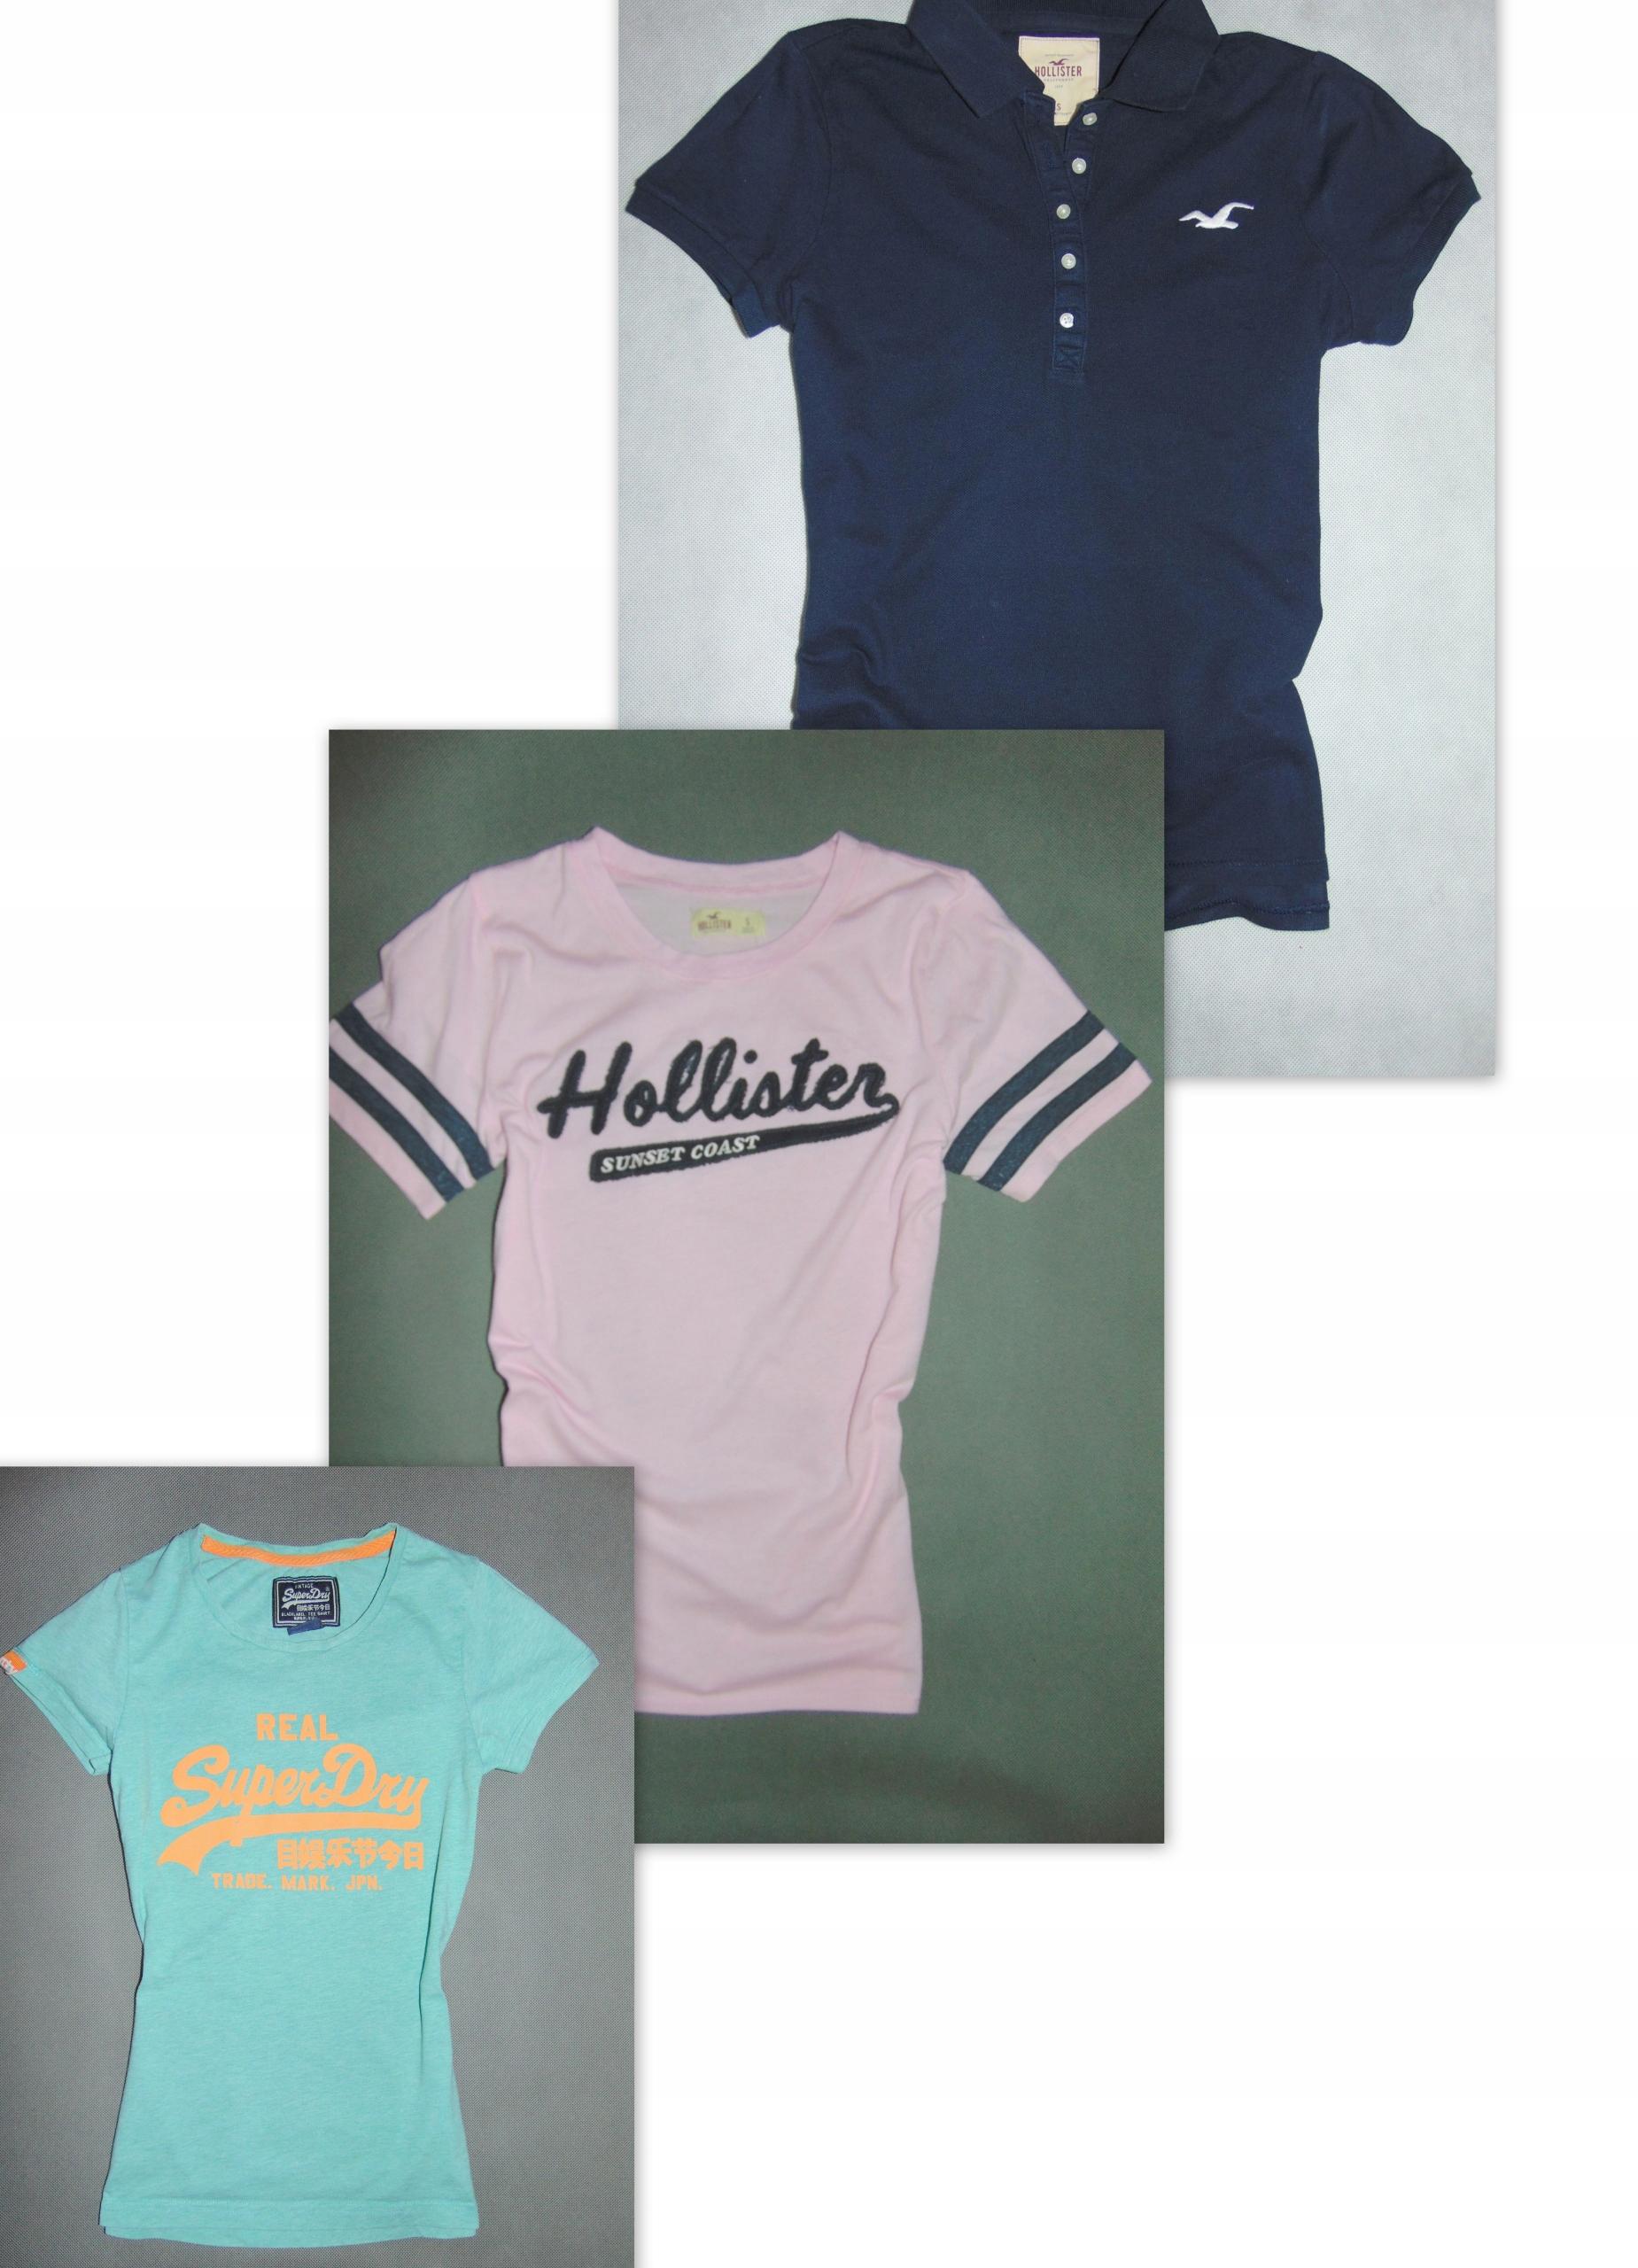 c1ef51fb23869 SUPERDRY HOLLISTER 3 szt koszulki damskie r S - 7708603988 - oficjalne  archiwum allegro